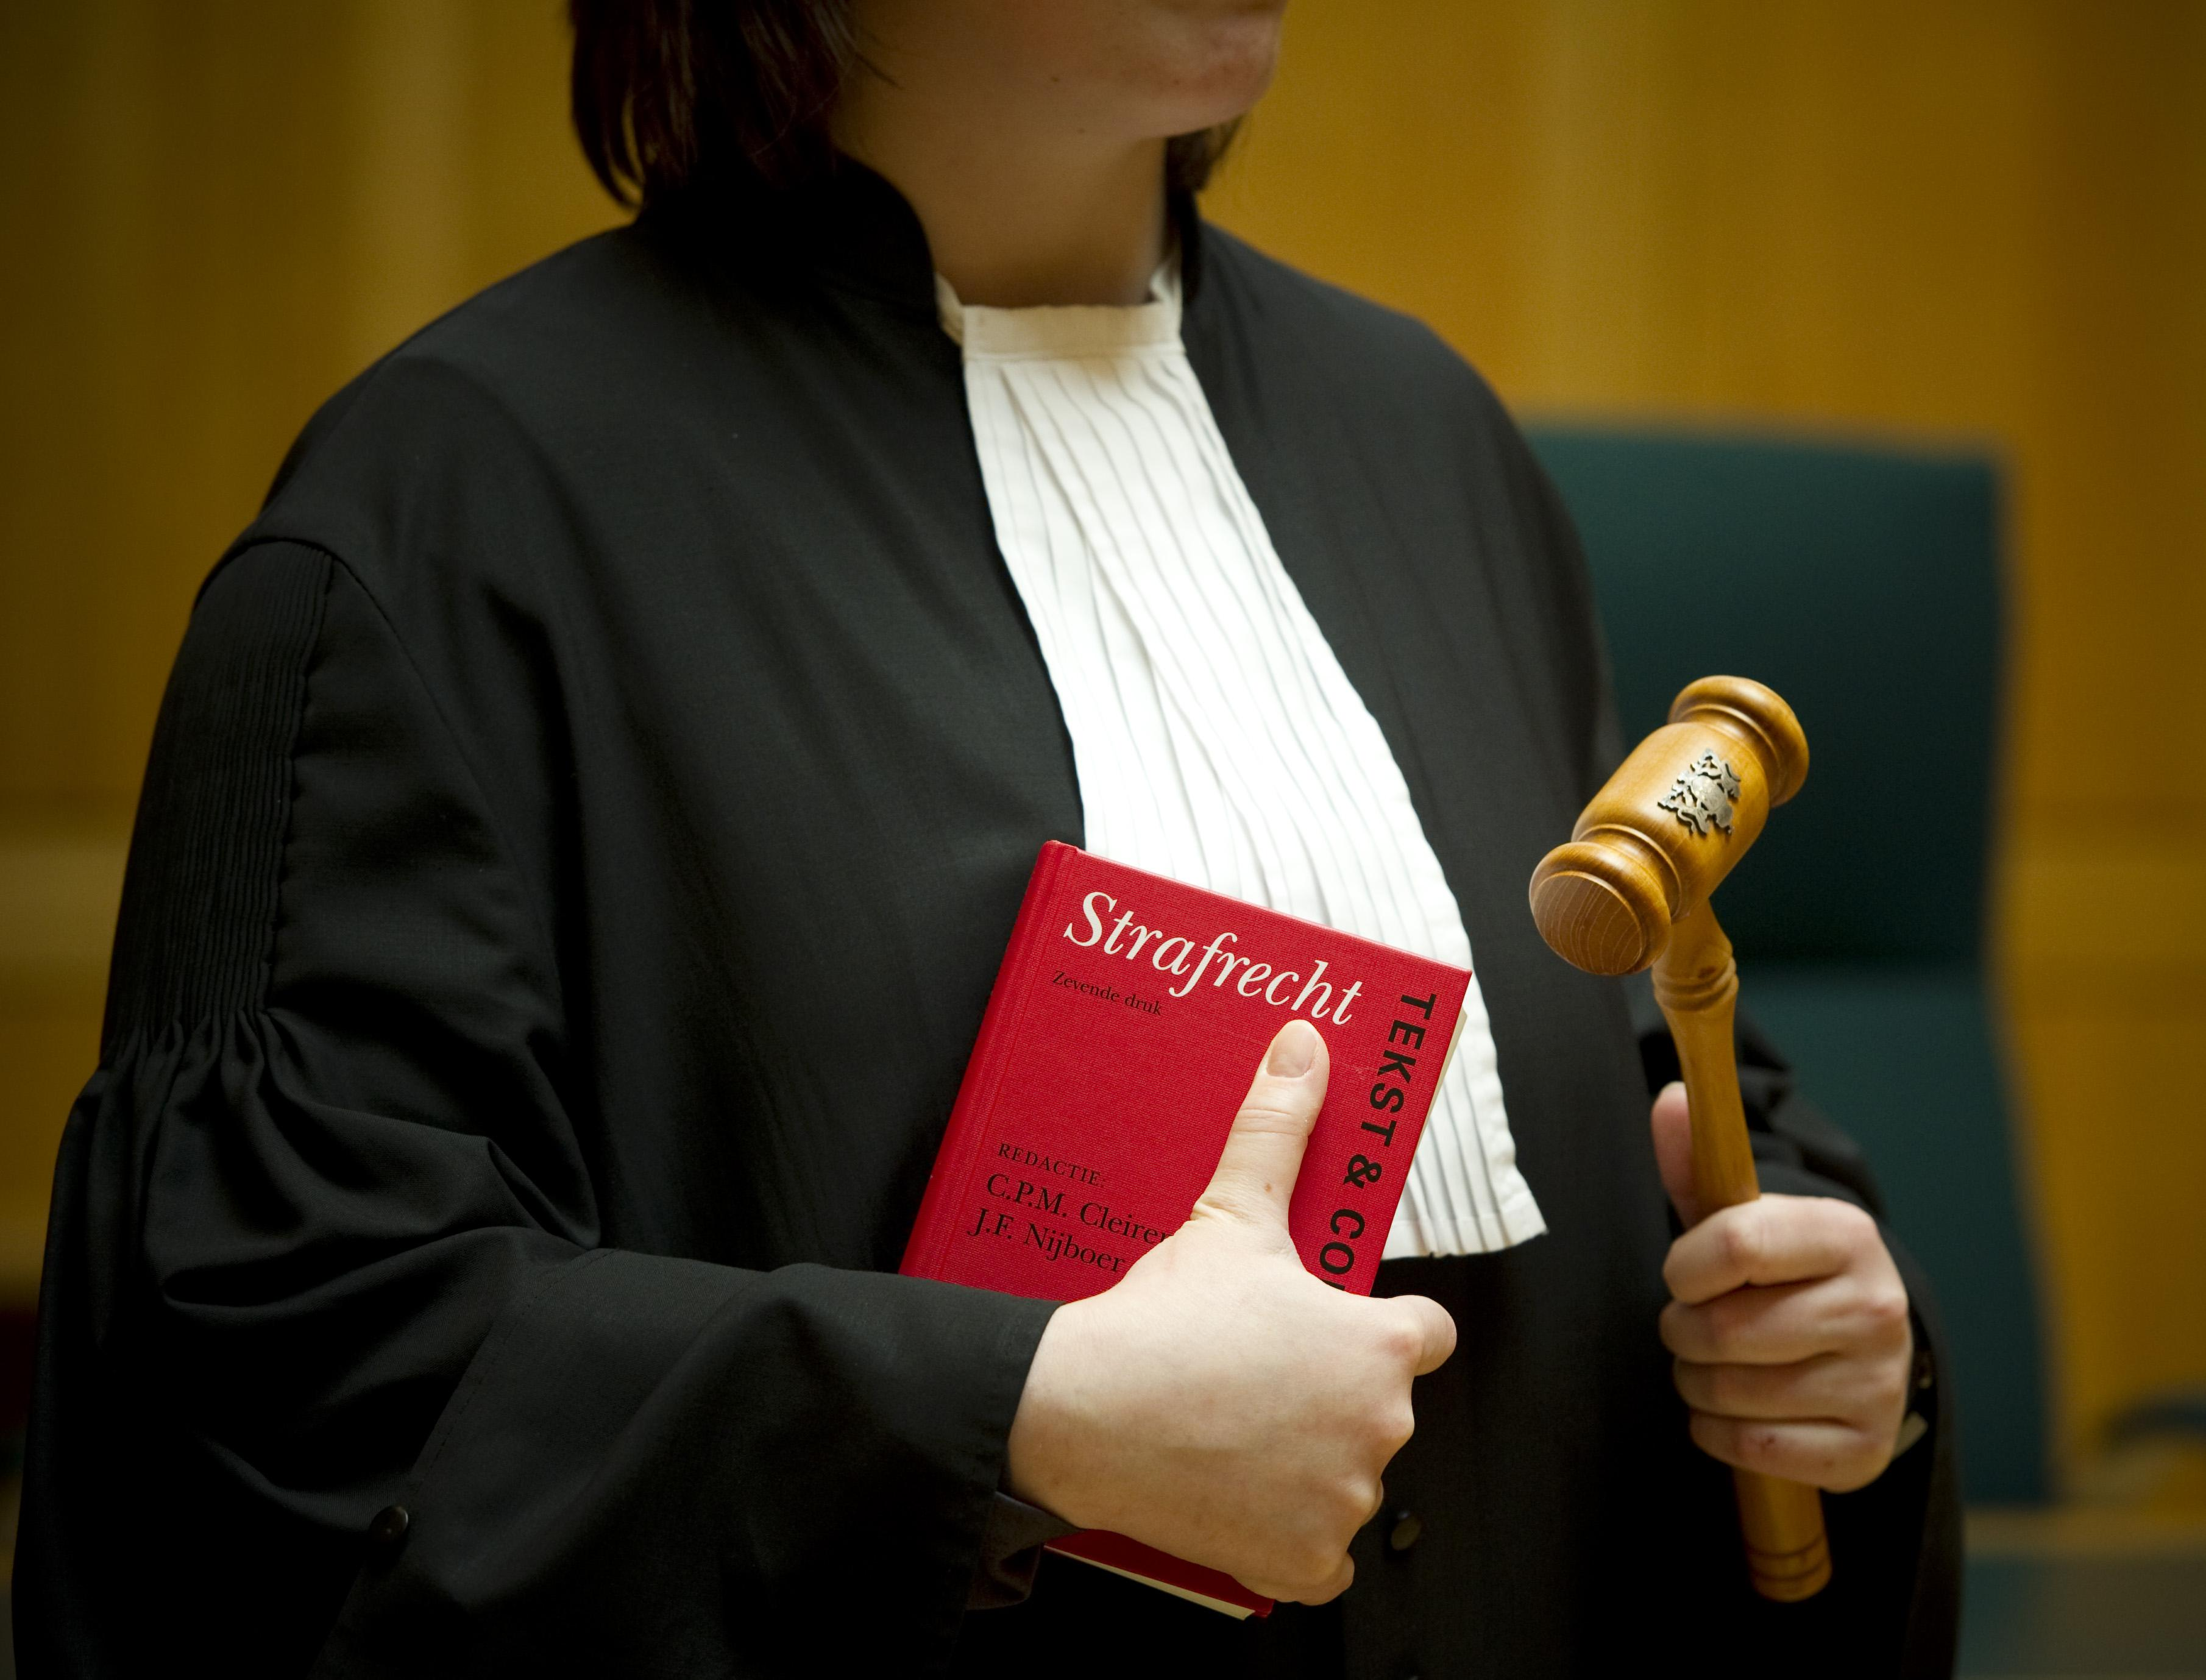 Dik dossier over oplichter en afperser die slachtoffers maakte in Hoorn en Purmerend